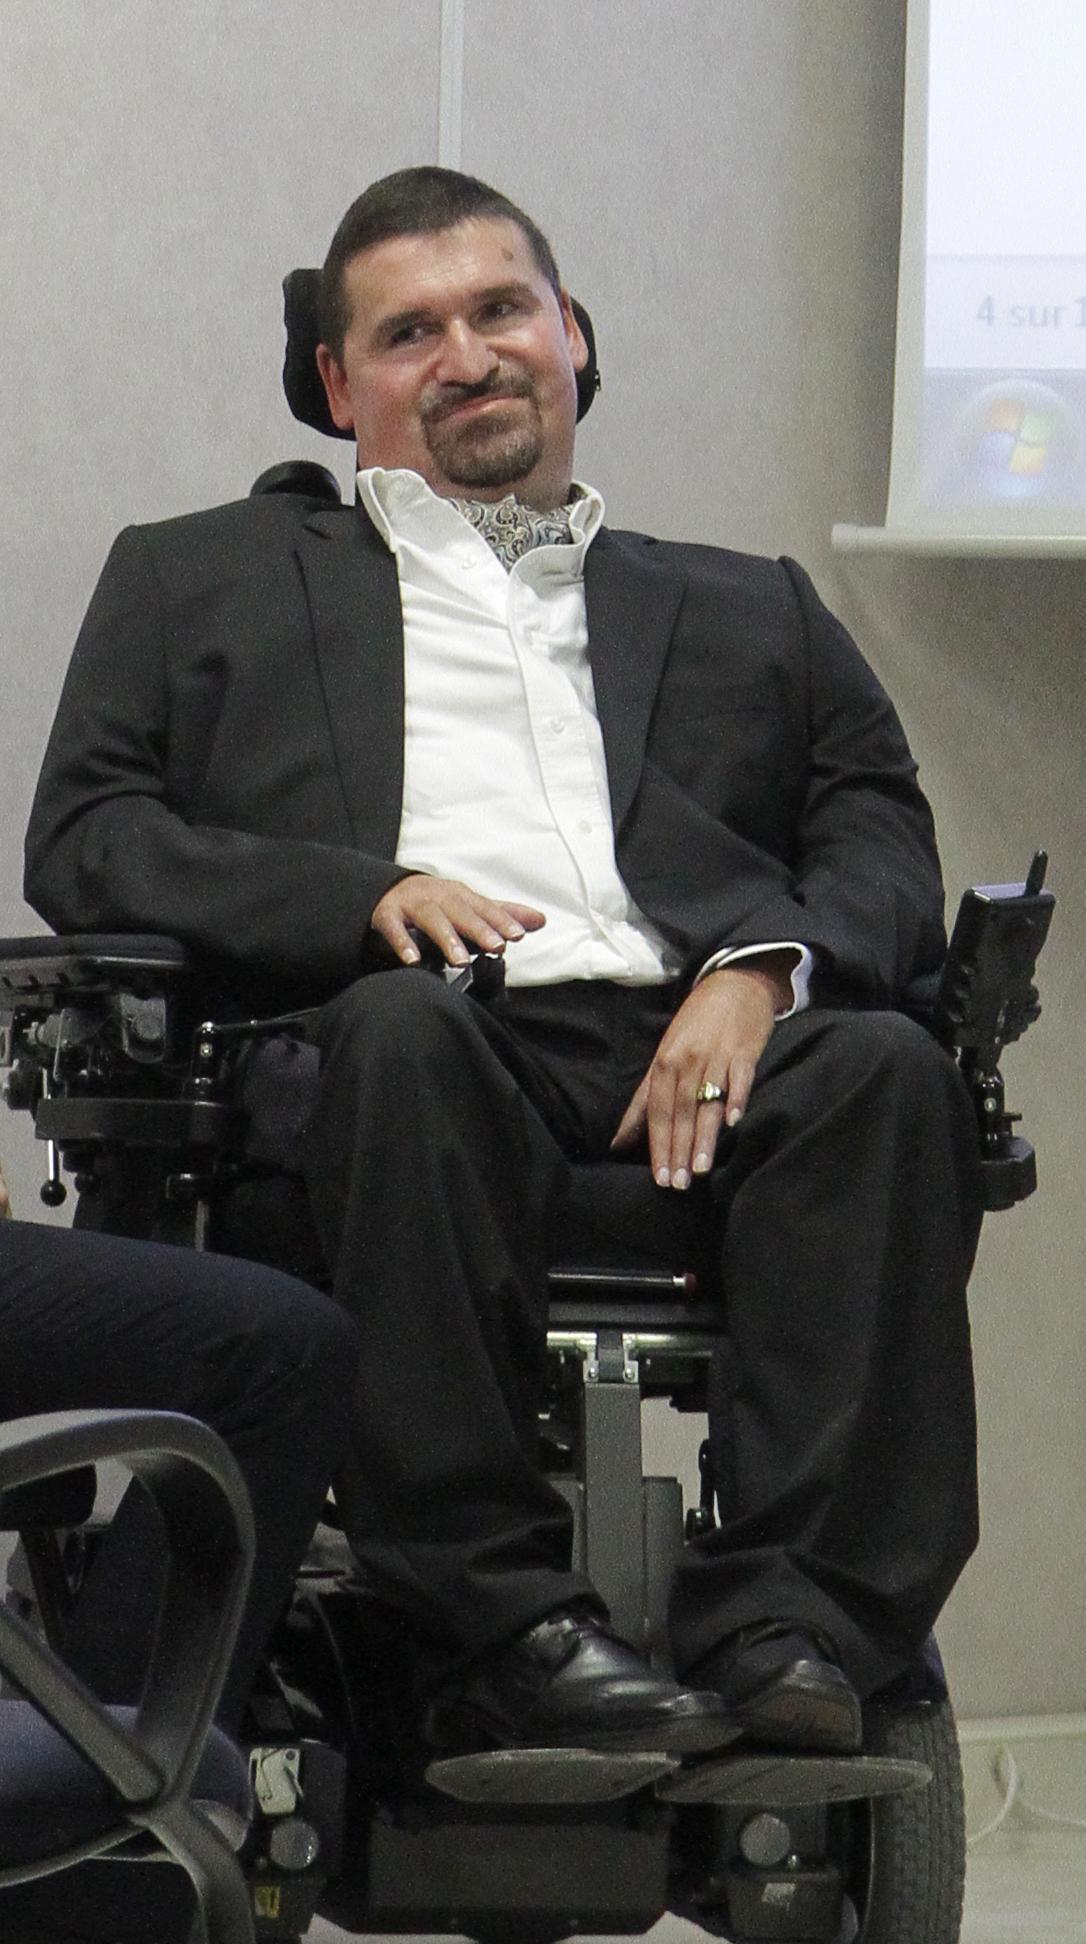 Jean-Christophe Parisot de Bayard, the first disabled